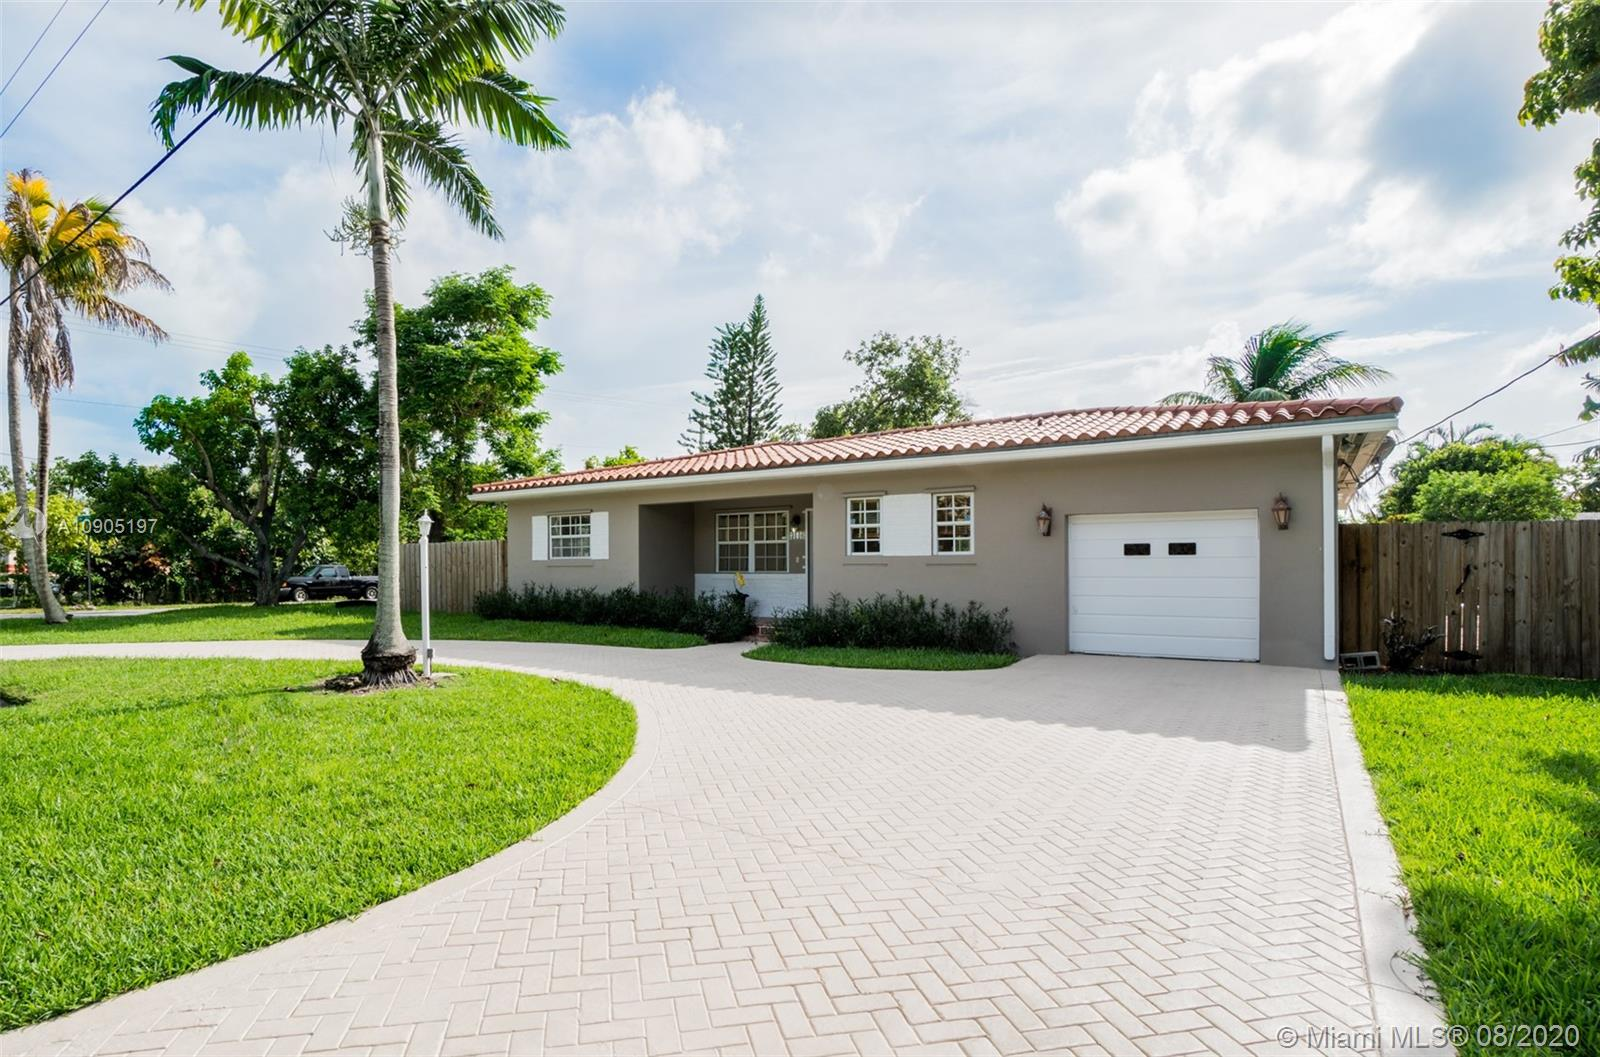 Coral Villas - 3140 SW 62nd Ct, Miami, FL 33155